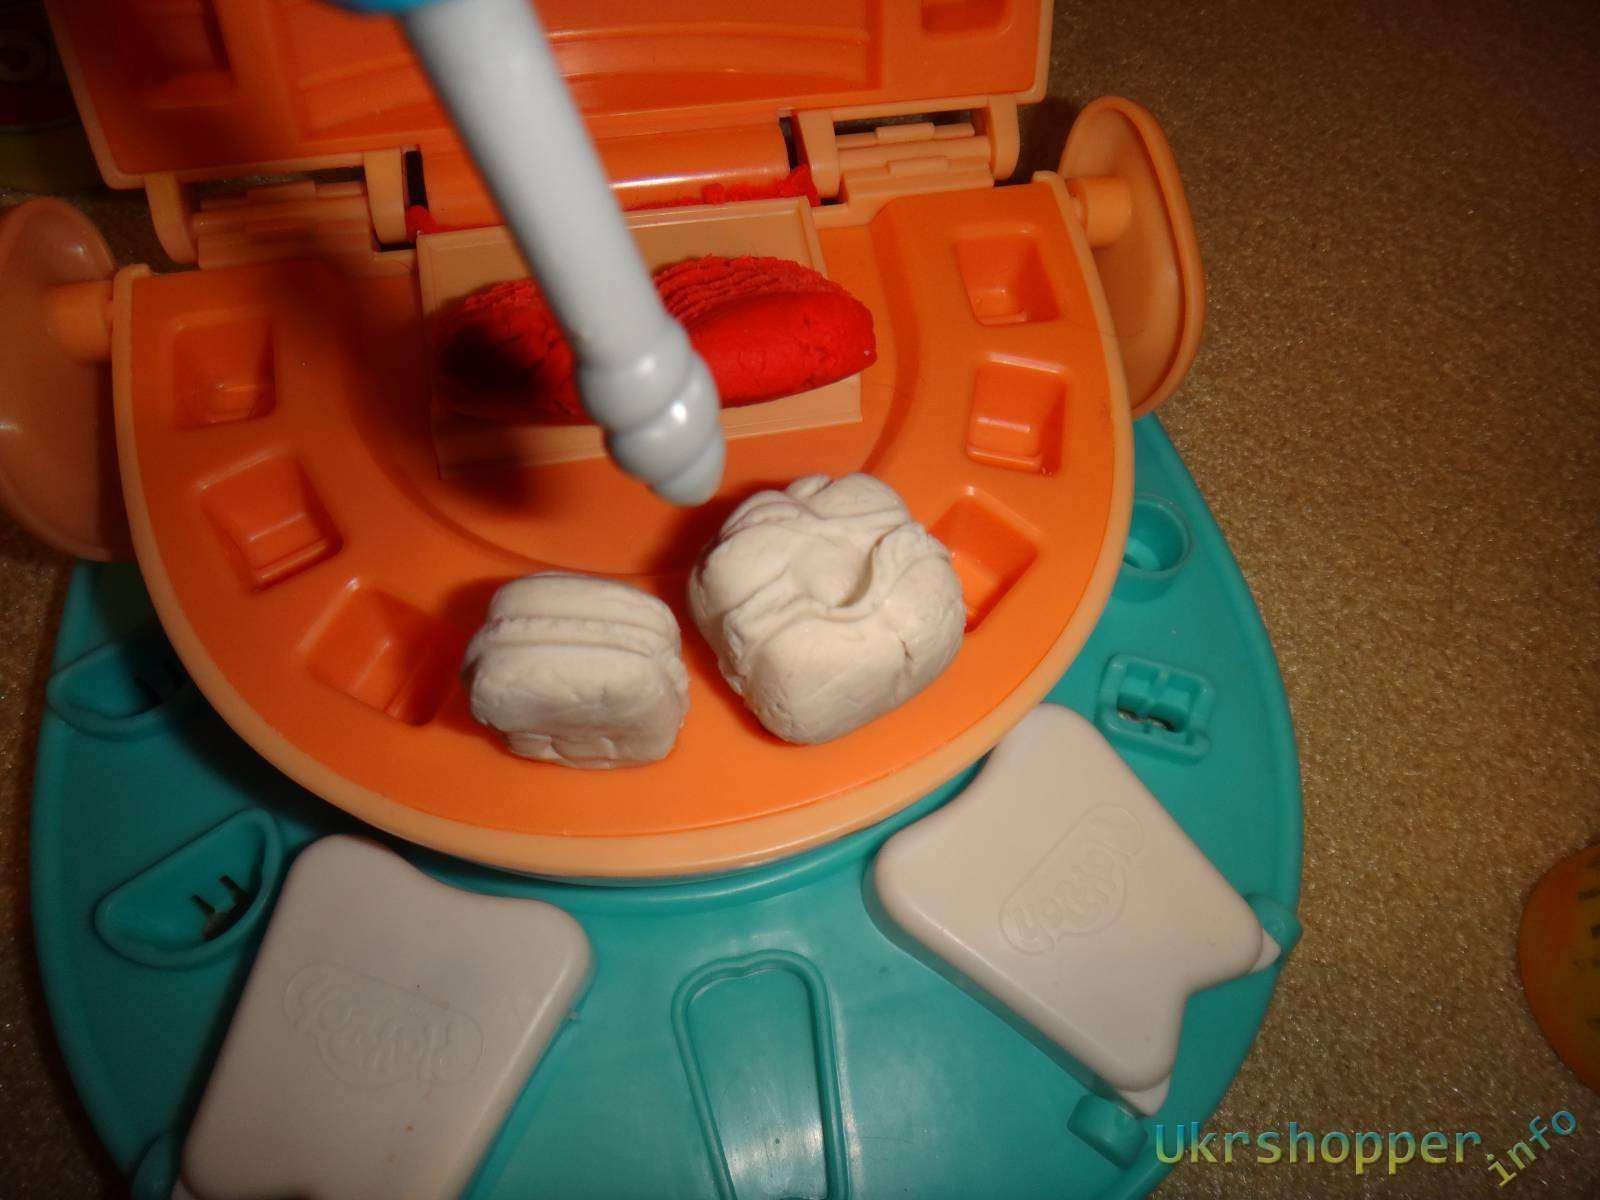 Amazon: Обзор набора для лепки серии Play Doh от ТМ Hasbro Мистер Зубастик